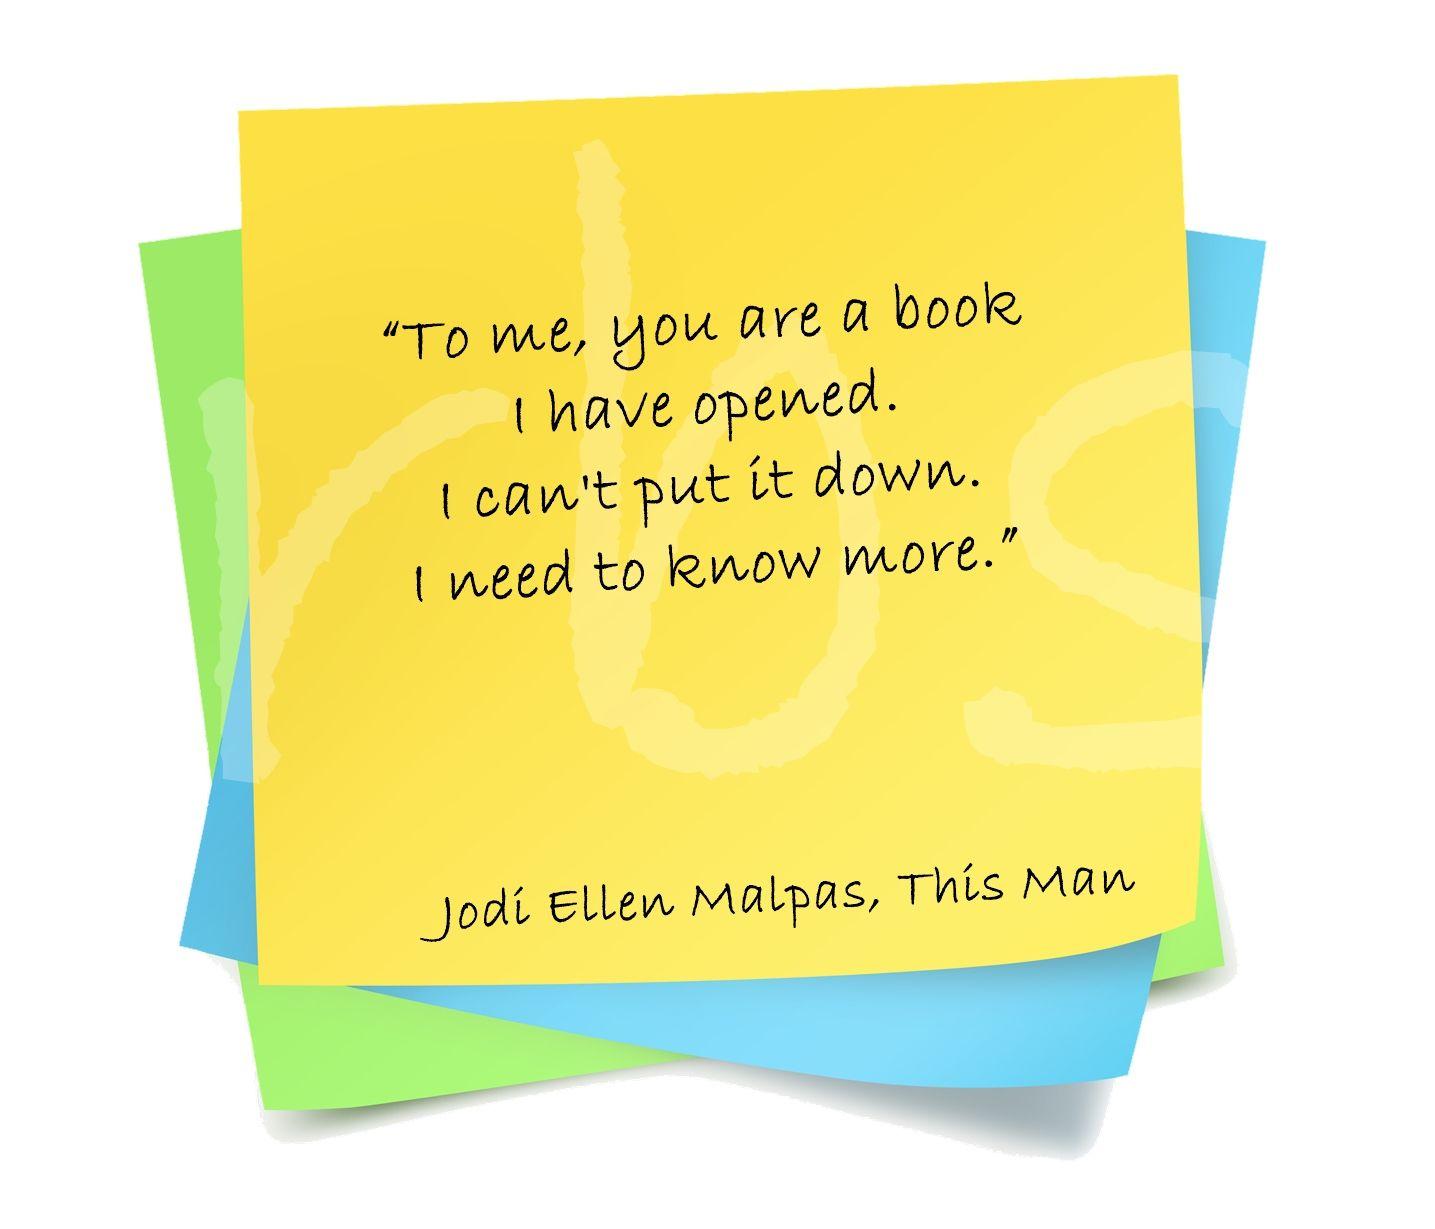 4 This Man By Jodi Ellen Malpas Quotes Goodreads Thisman Jodiellenmalpas Centraljessecloudnine Goodreads Reading Challenge Reading Challenge 2016 E Book